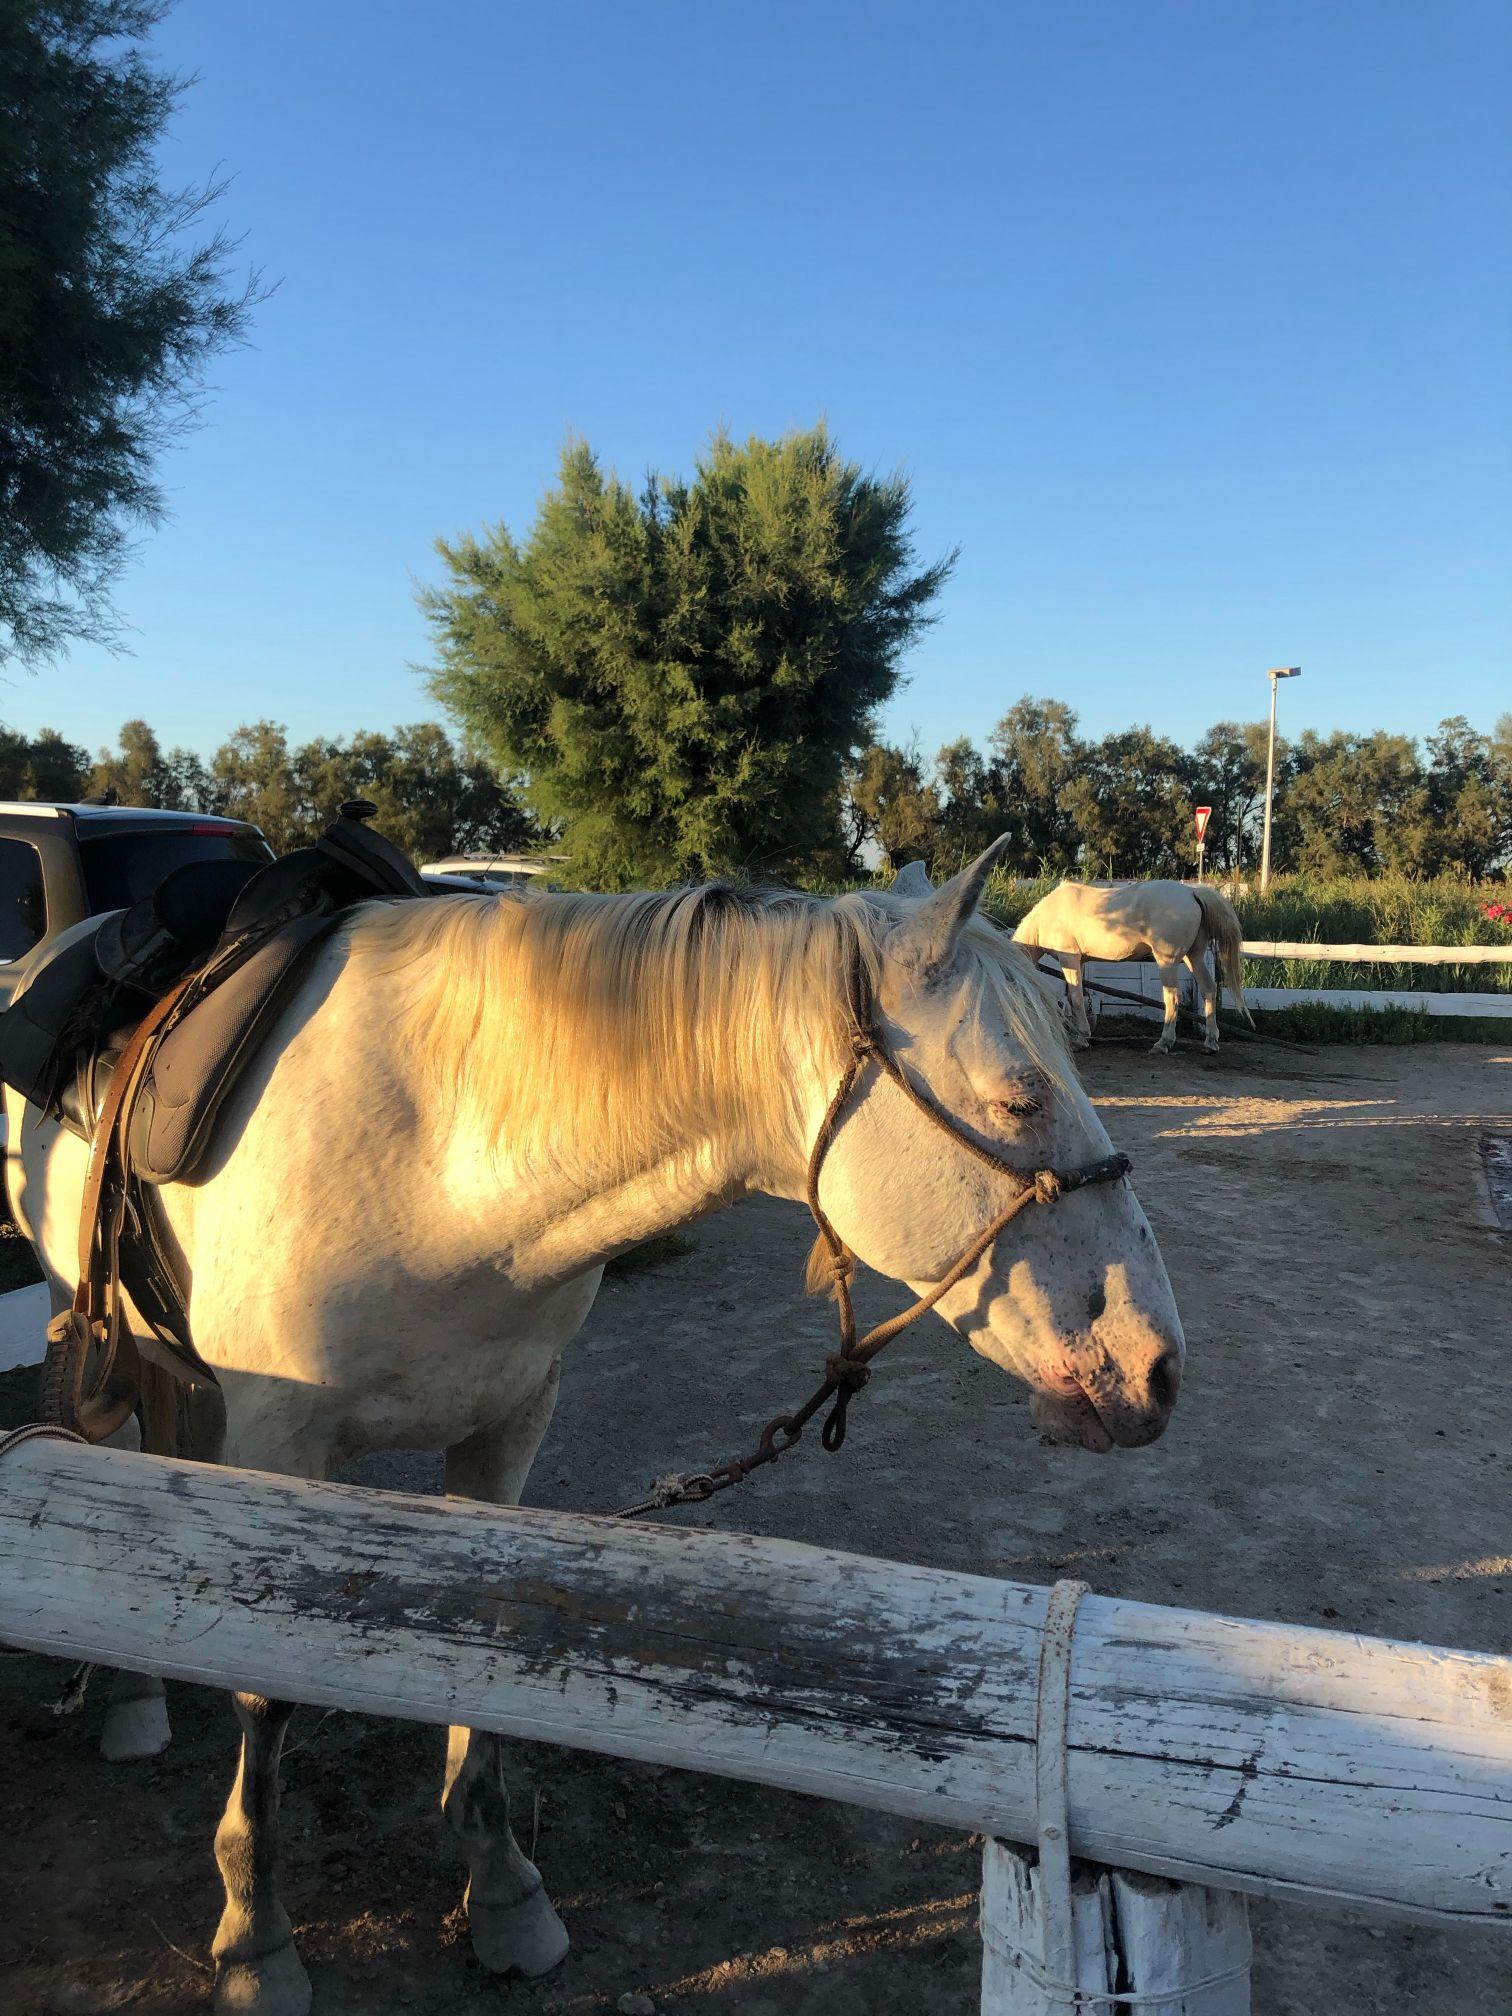 Horse head sunset camargue france